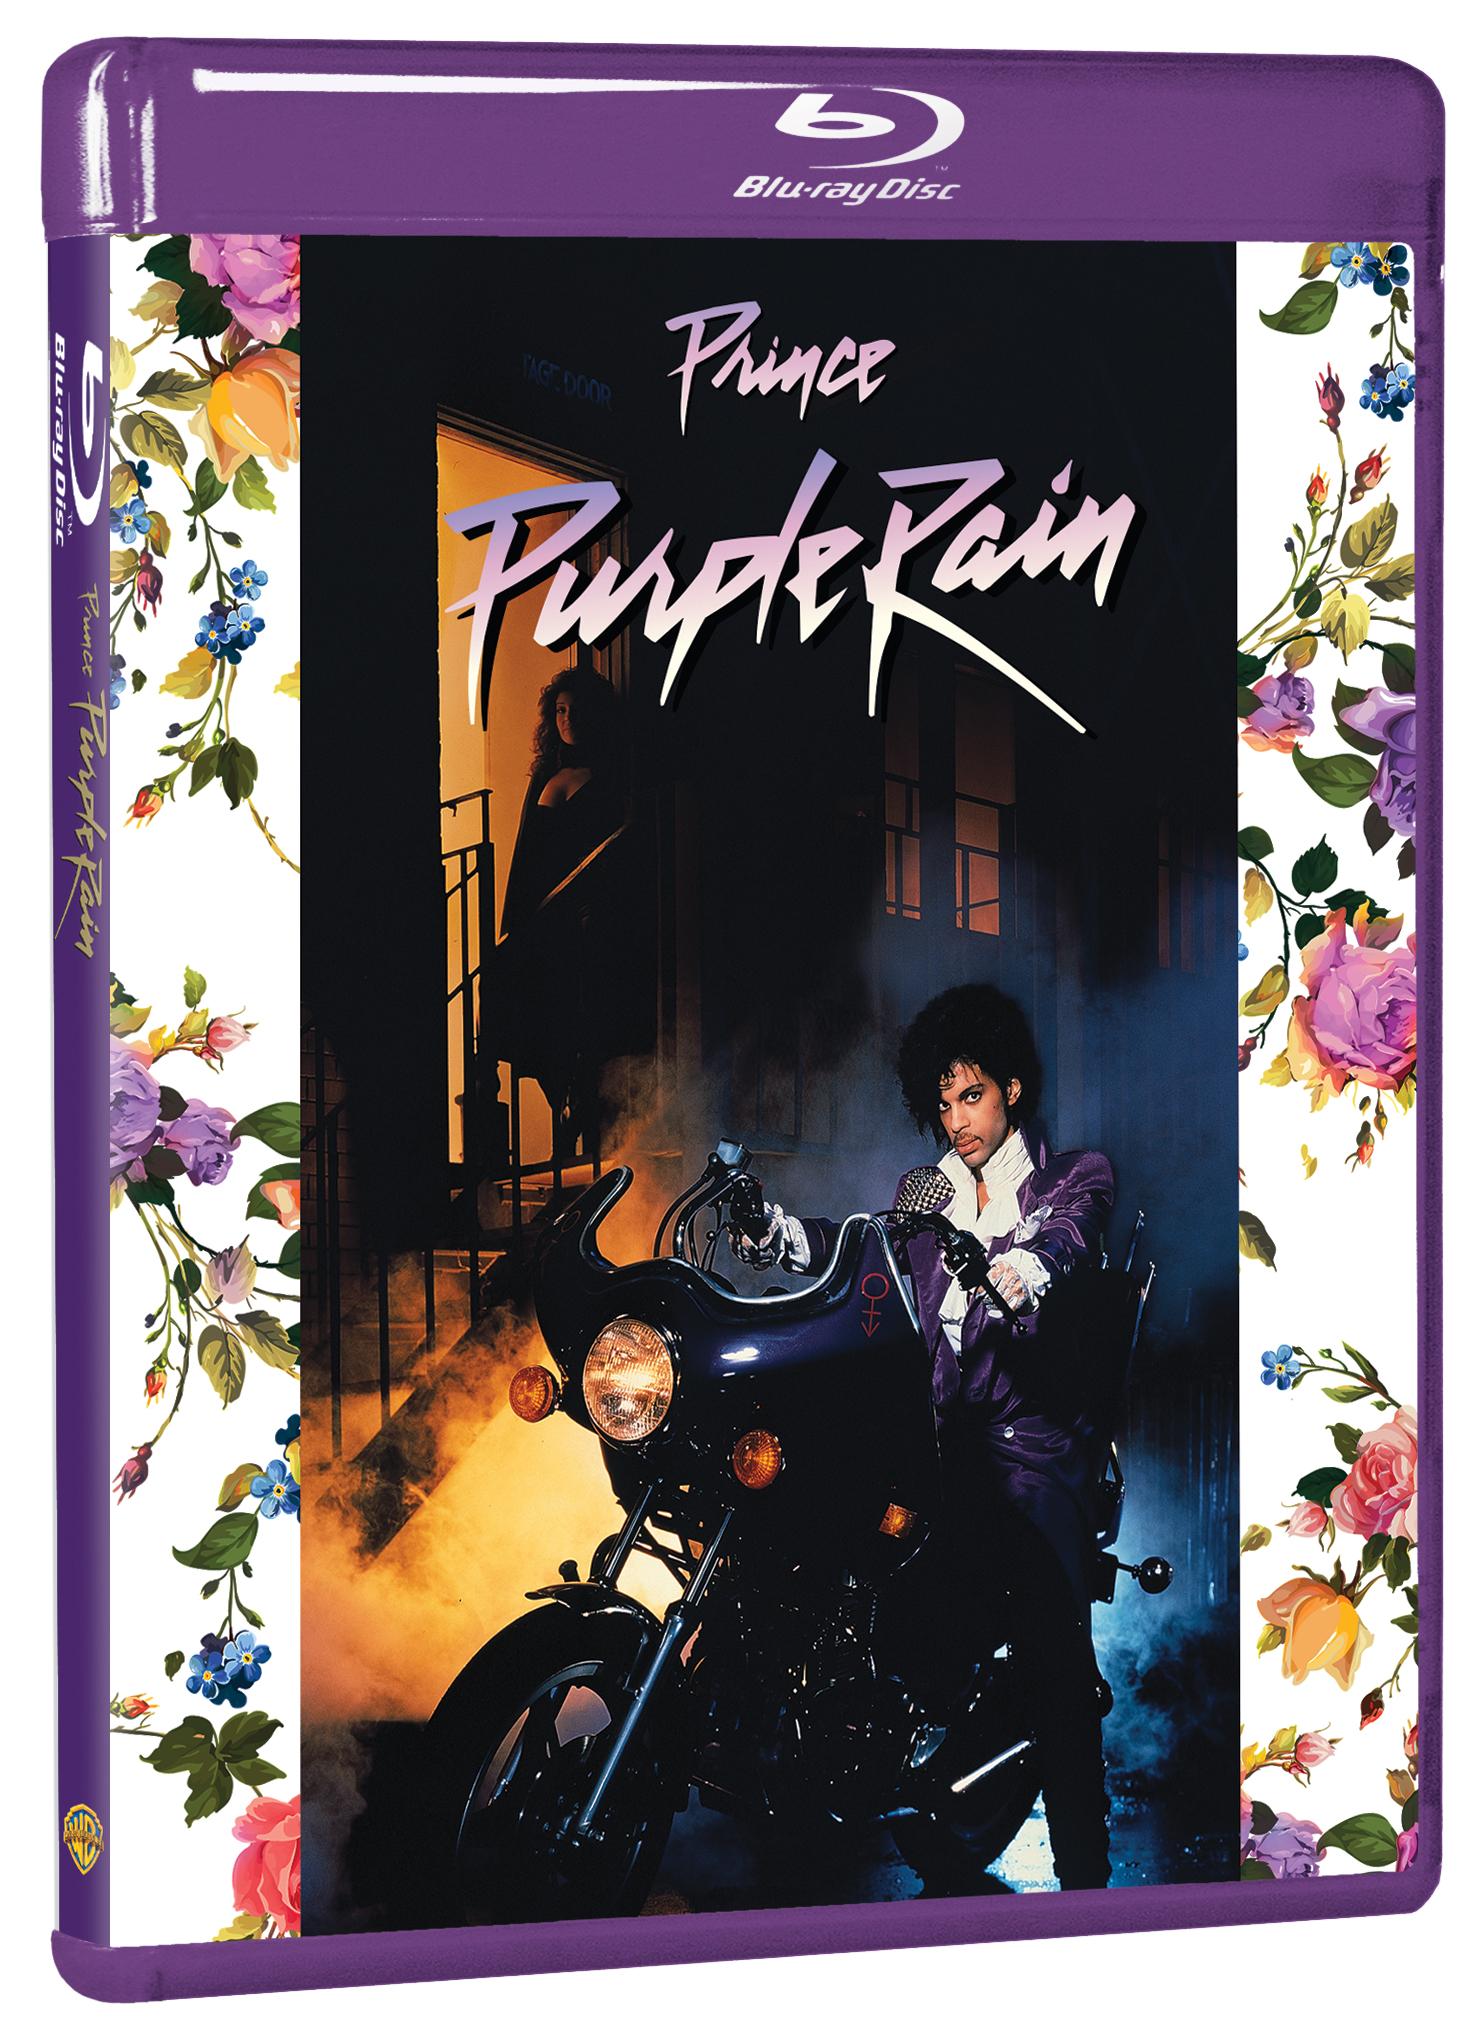 PRINCE_PurpleRain_BLU-RAY_3D_WRAP